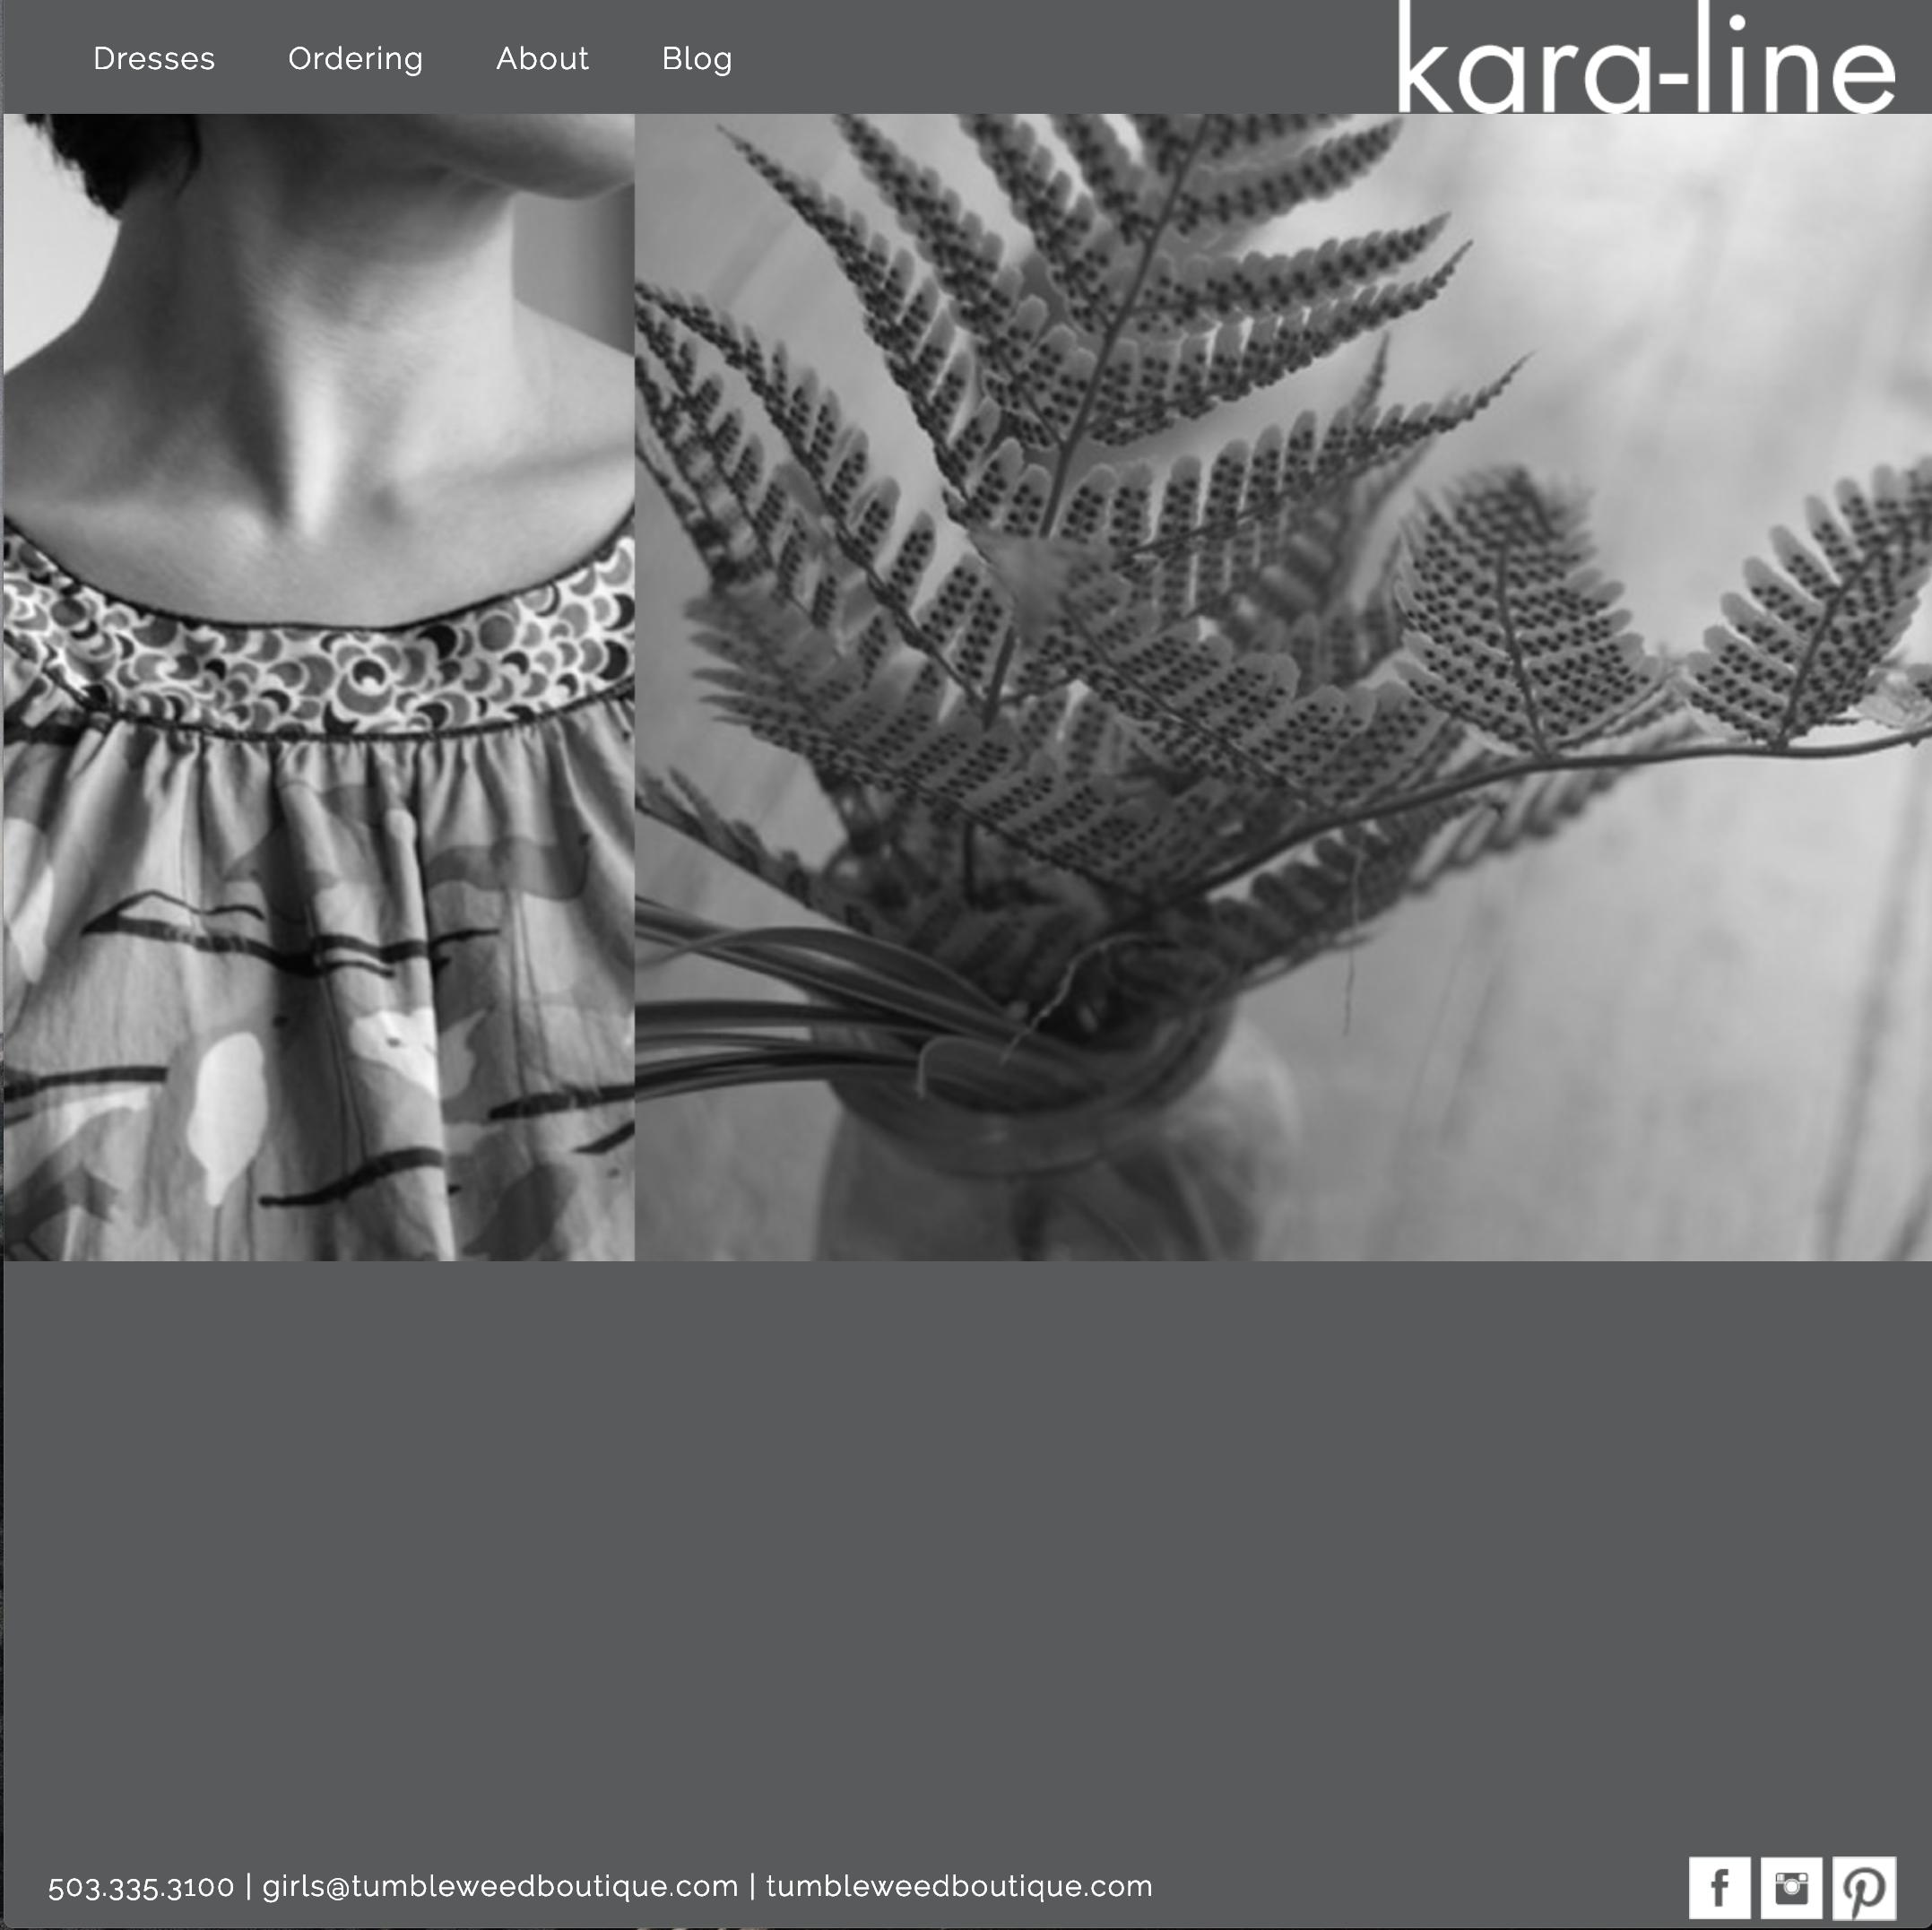 karaline.png